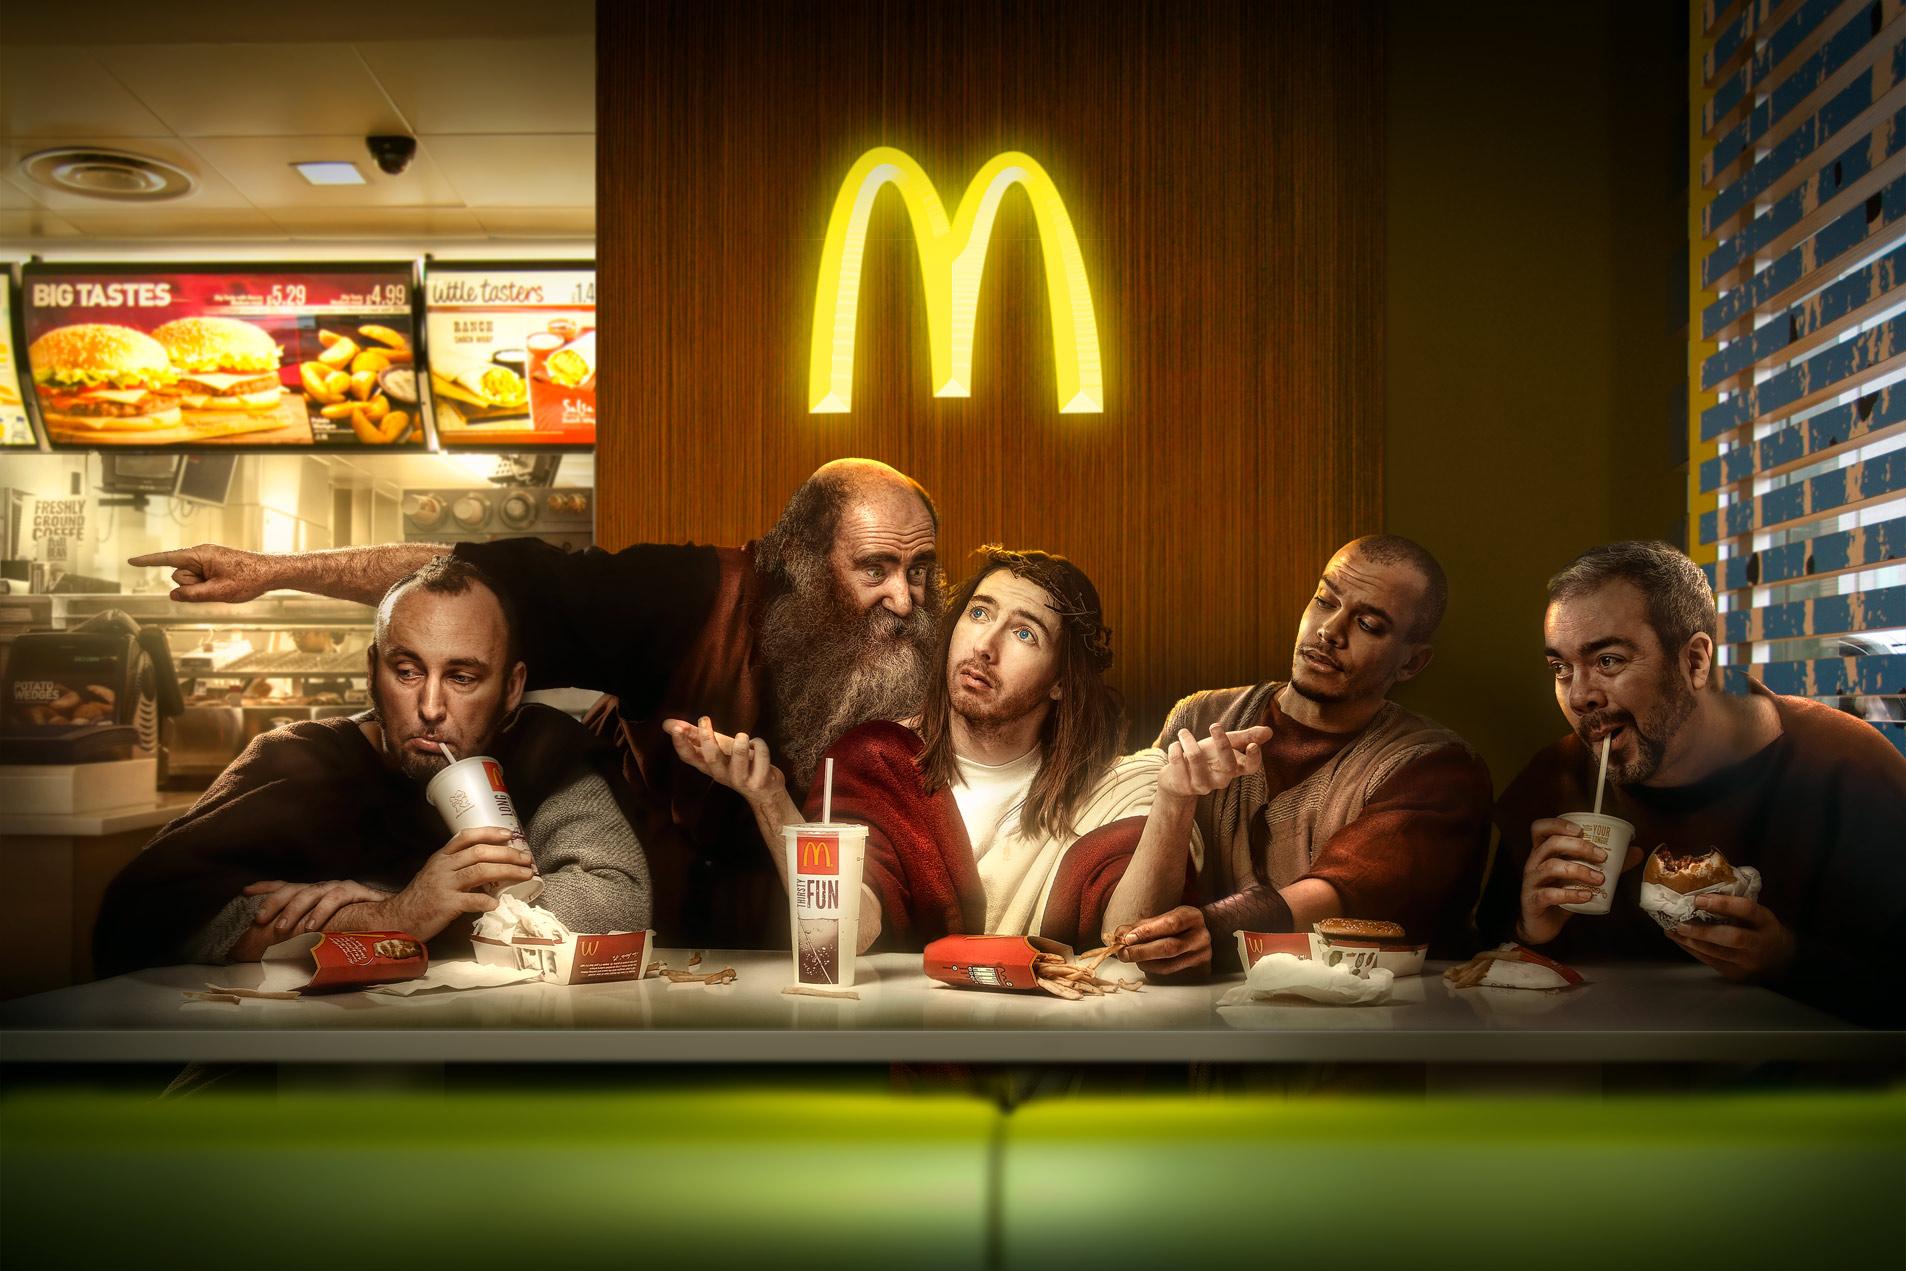 Chris Clor last Supper in MacDonalds